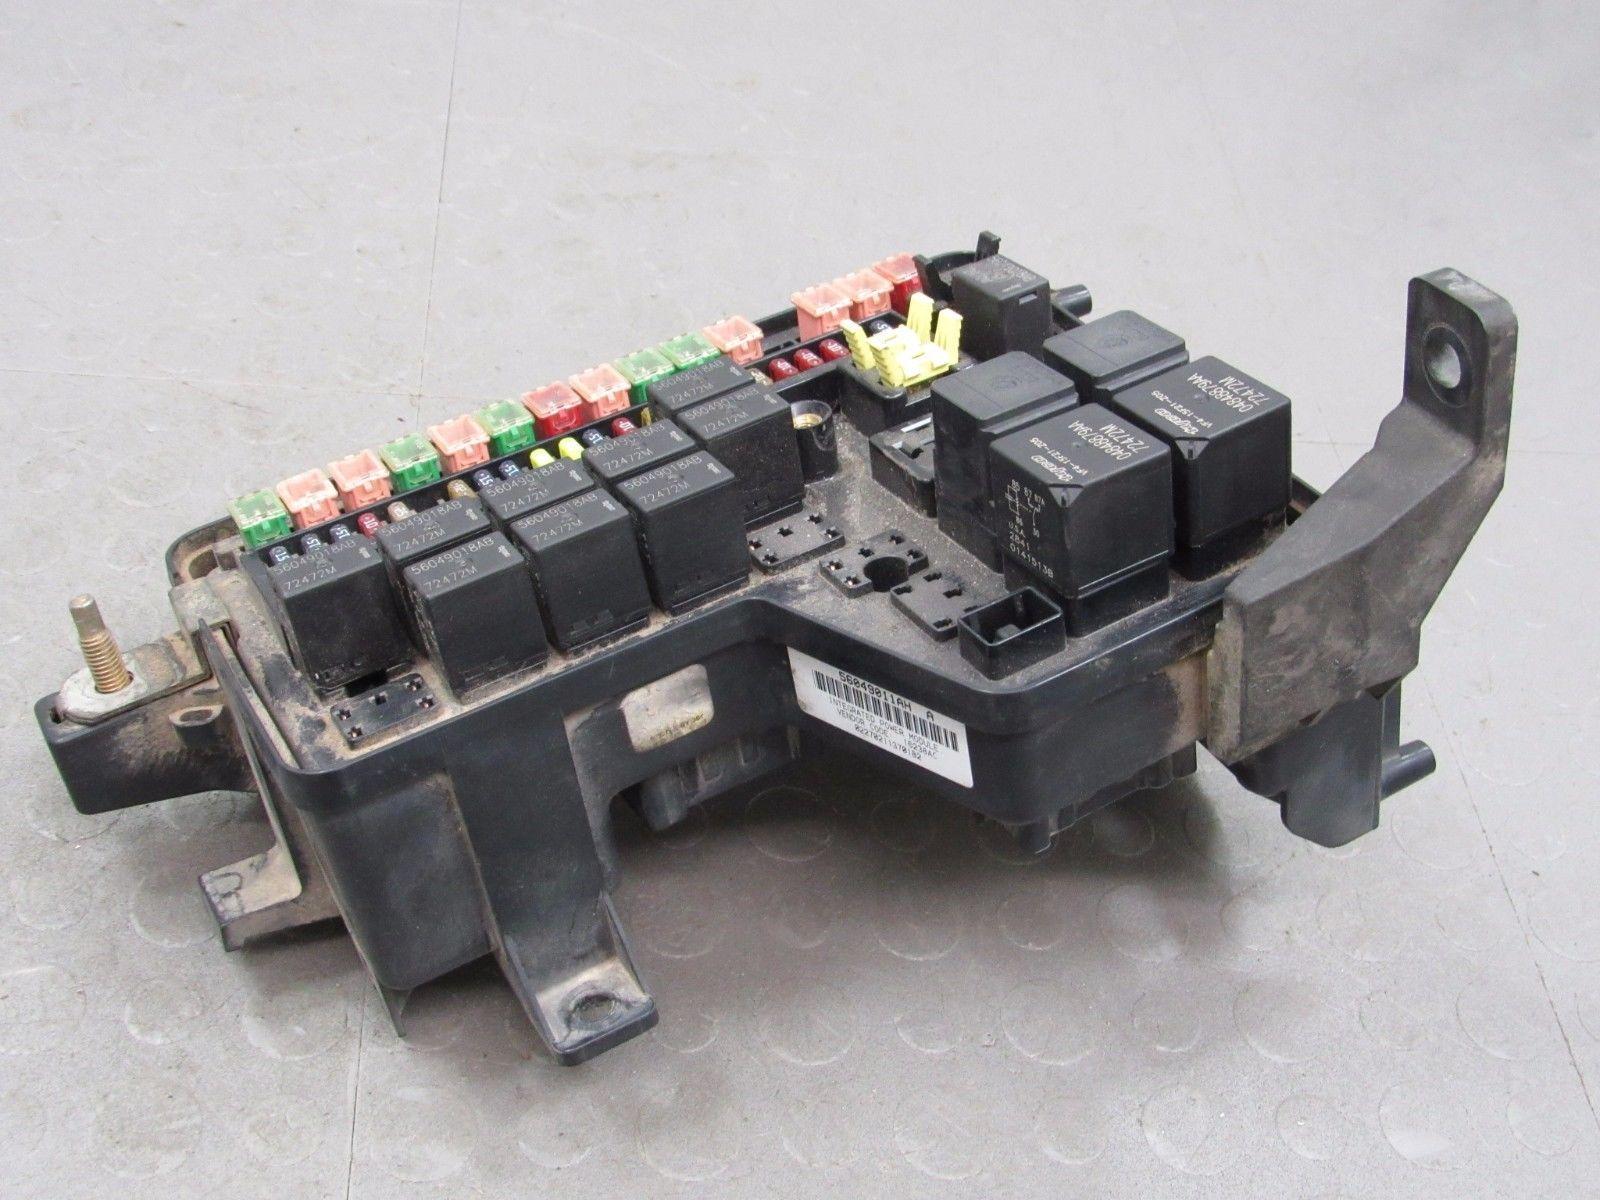 02 03 Dodge Ram Integrated Power Distribution Module Fuse Box 56049011ah Cr